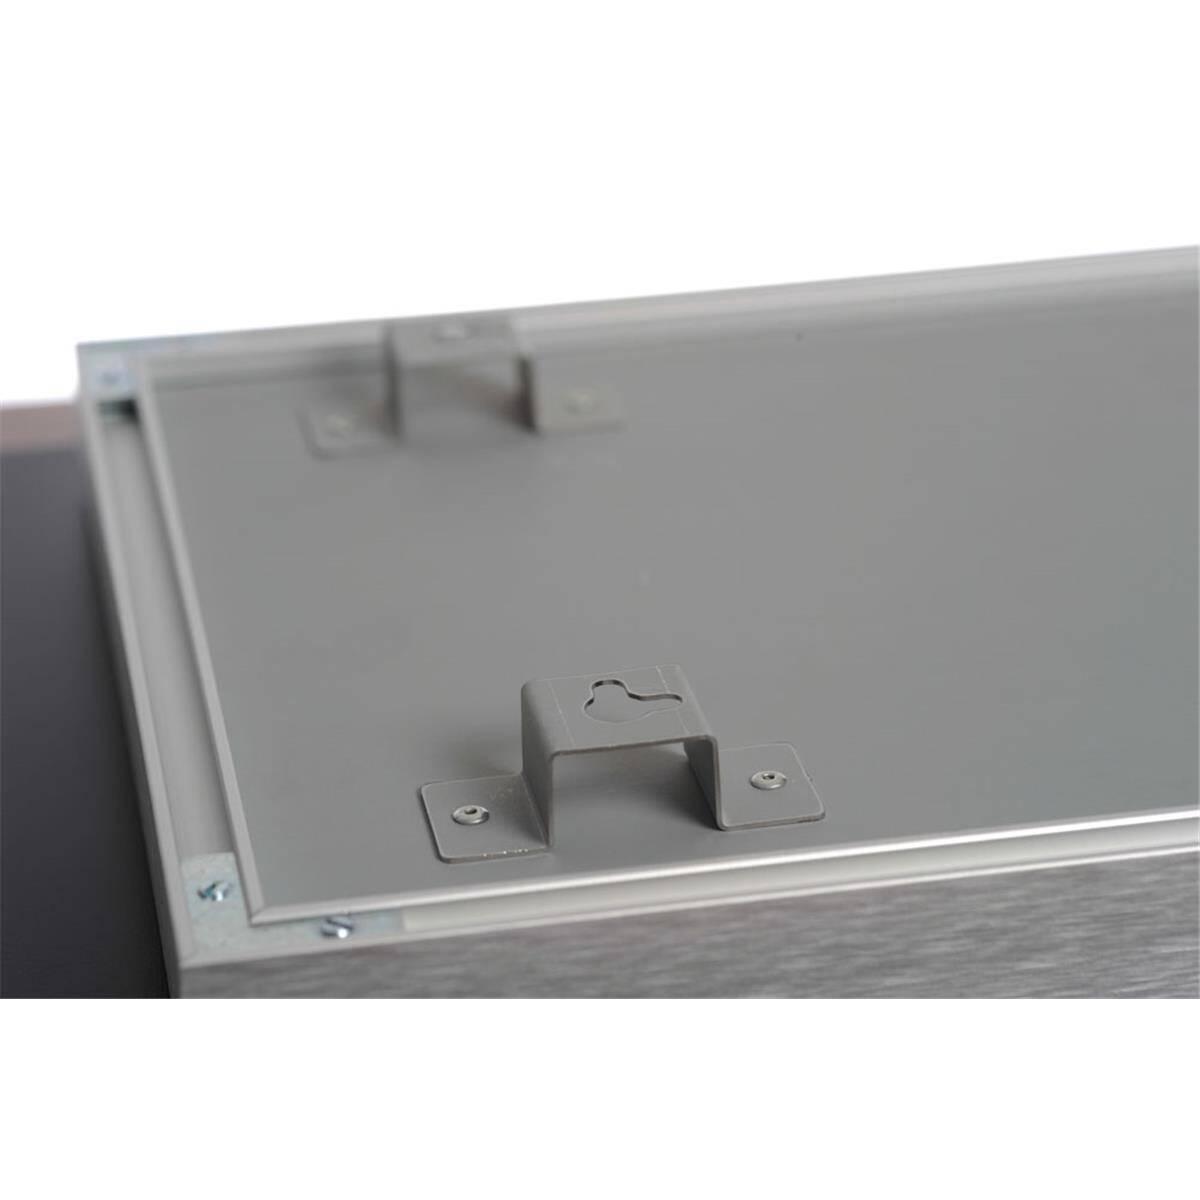 keramik infrarotheizung elbotherm 800 watt barro 499 00. Black Bedroom Furniture Sets. Home Design Ideas